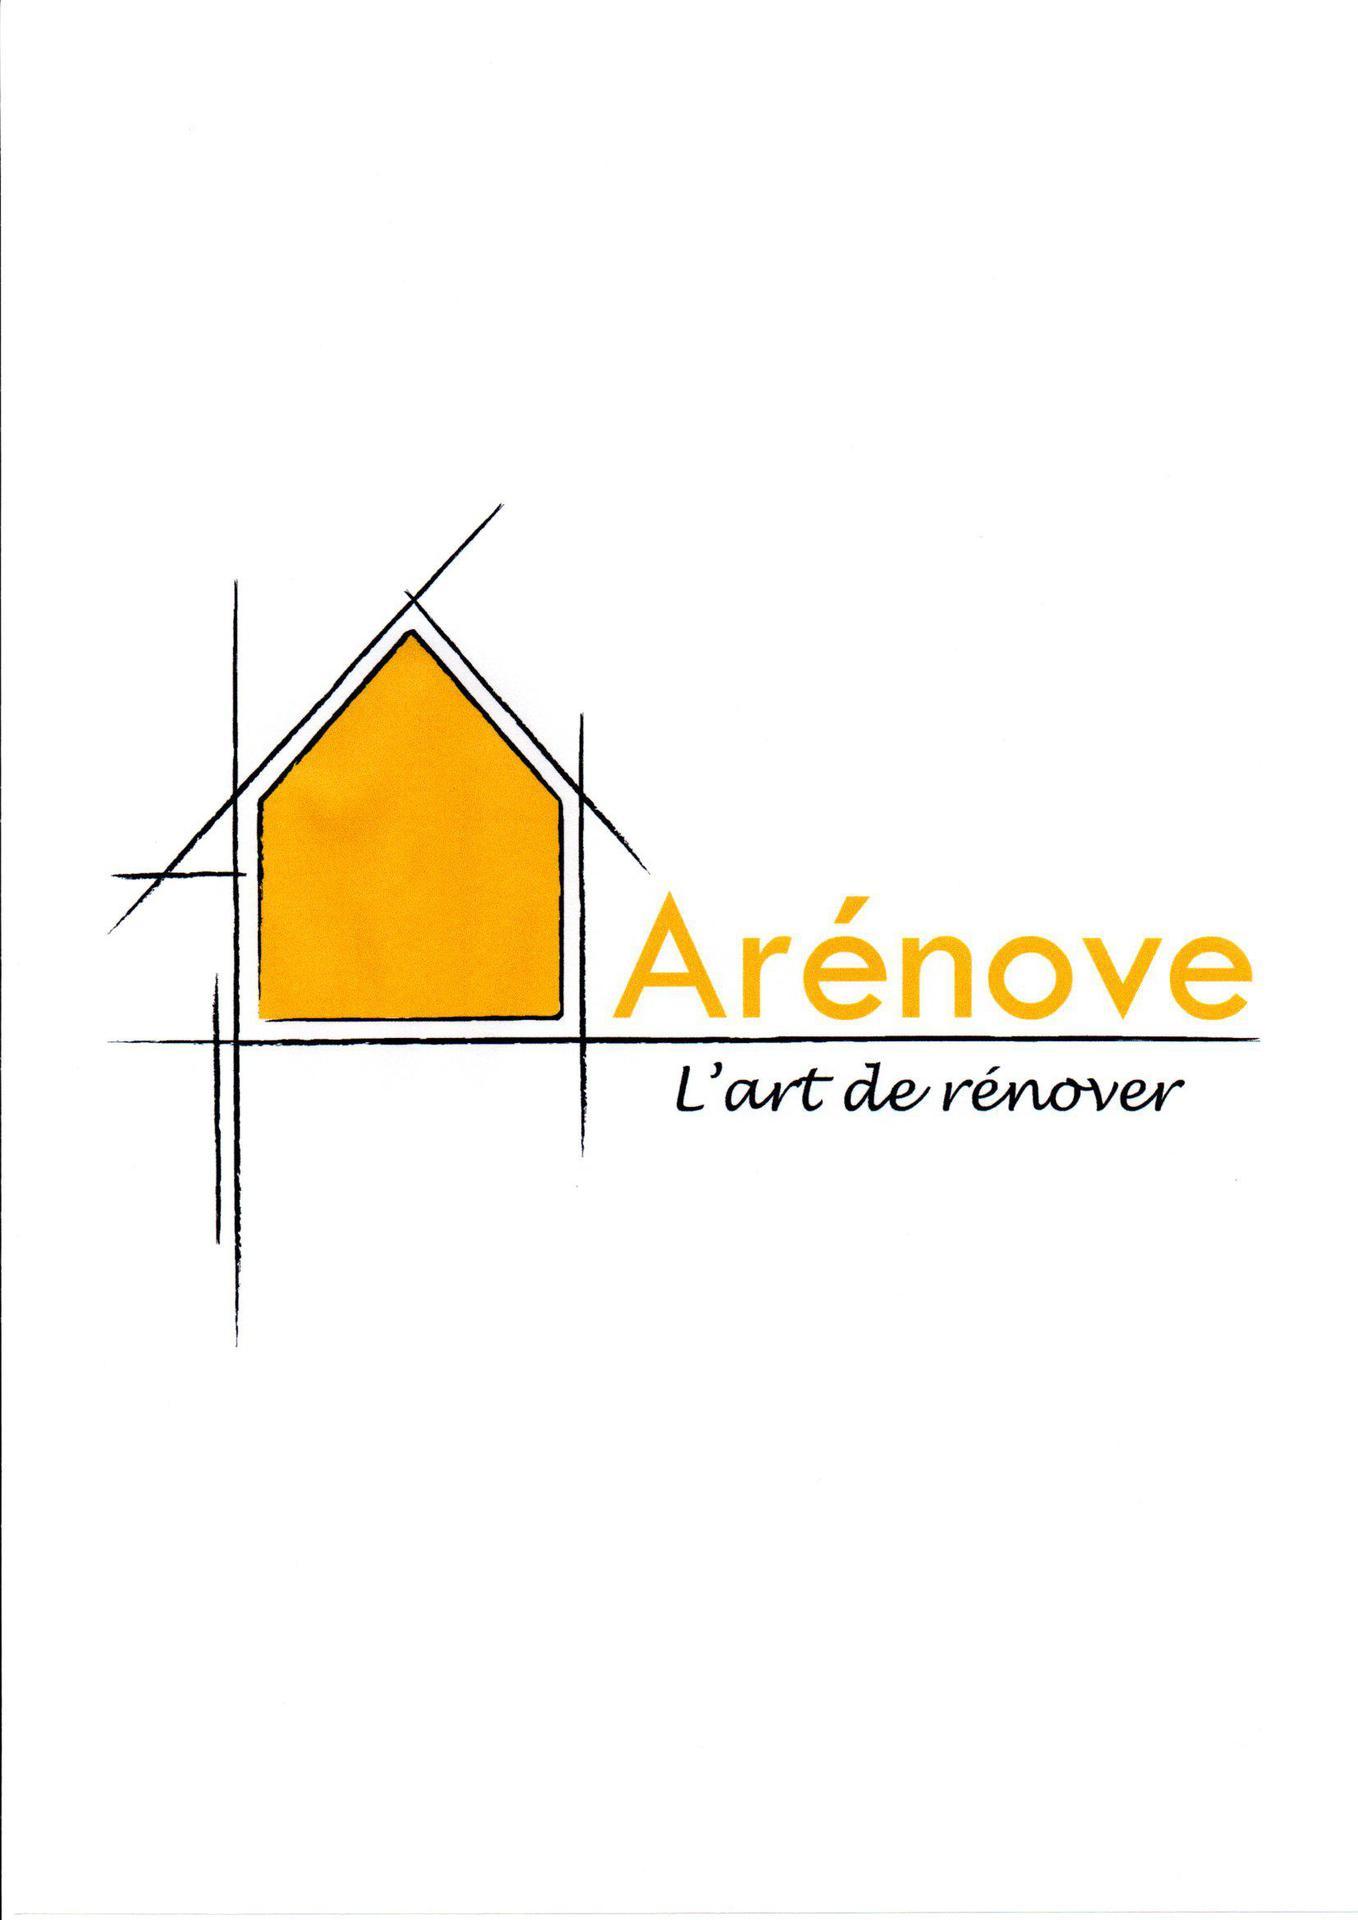 Logo Arénove